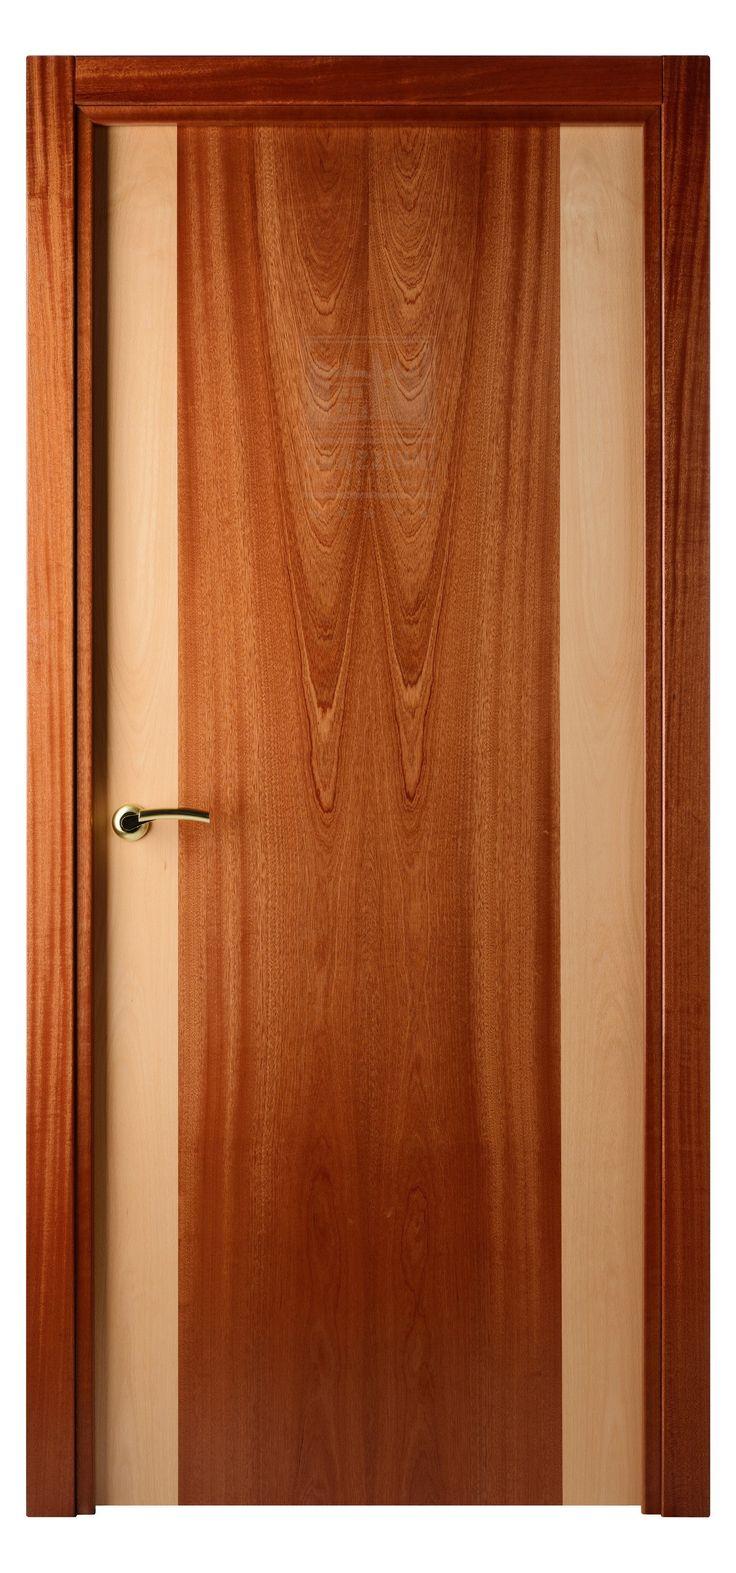 51 Best Images About Exotic Wood Veneer Doors On Pinterest